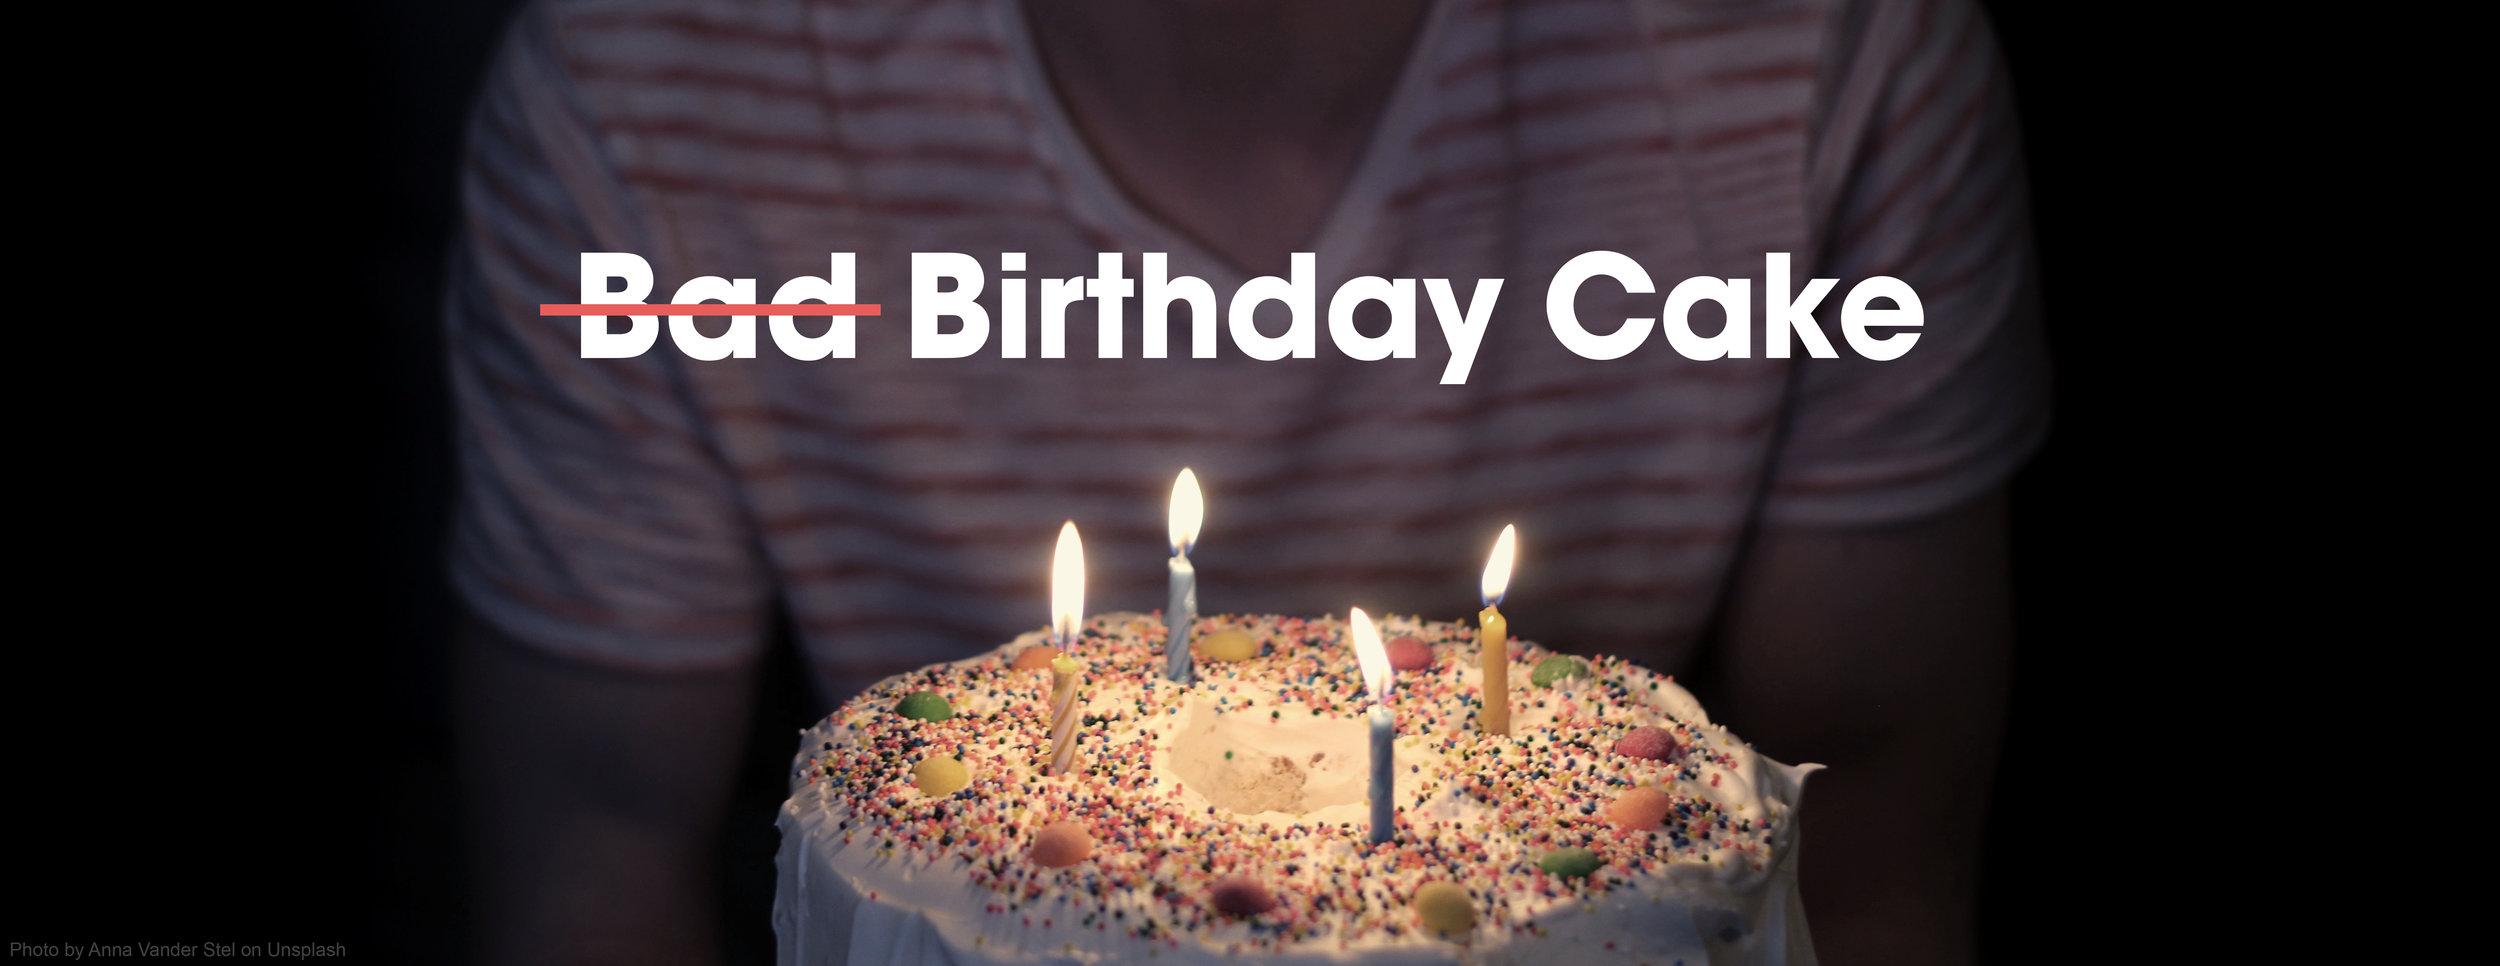 DarioNarvaez_Portfolio_Birthday_Cake_01-01.jpg